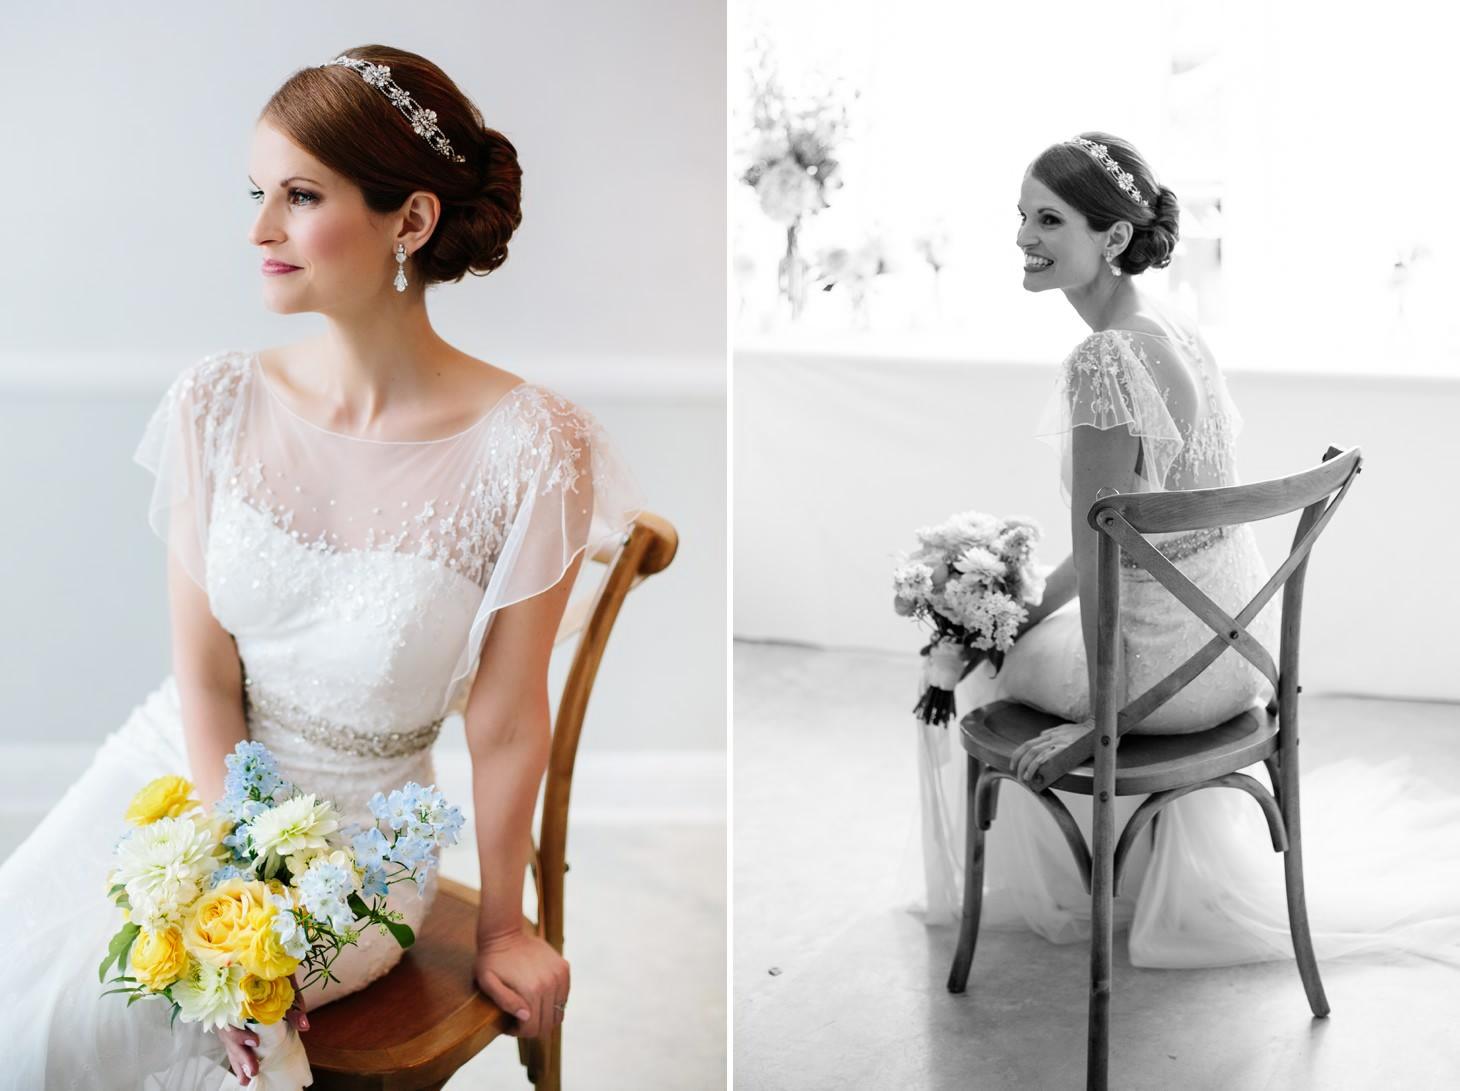 009-nyc-wedding-photographer-brooklyn-restaurant-2.jpg